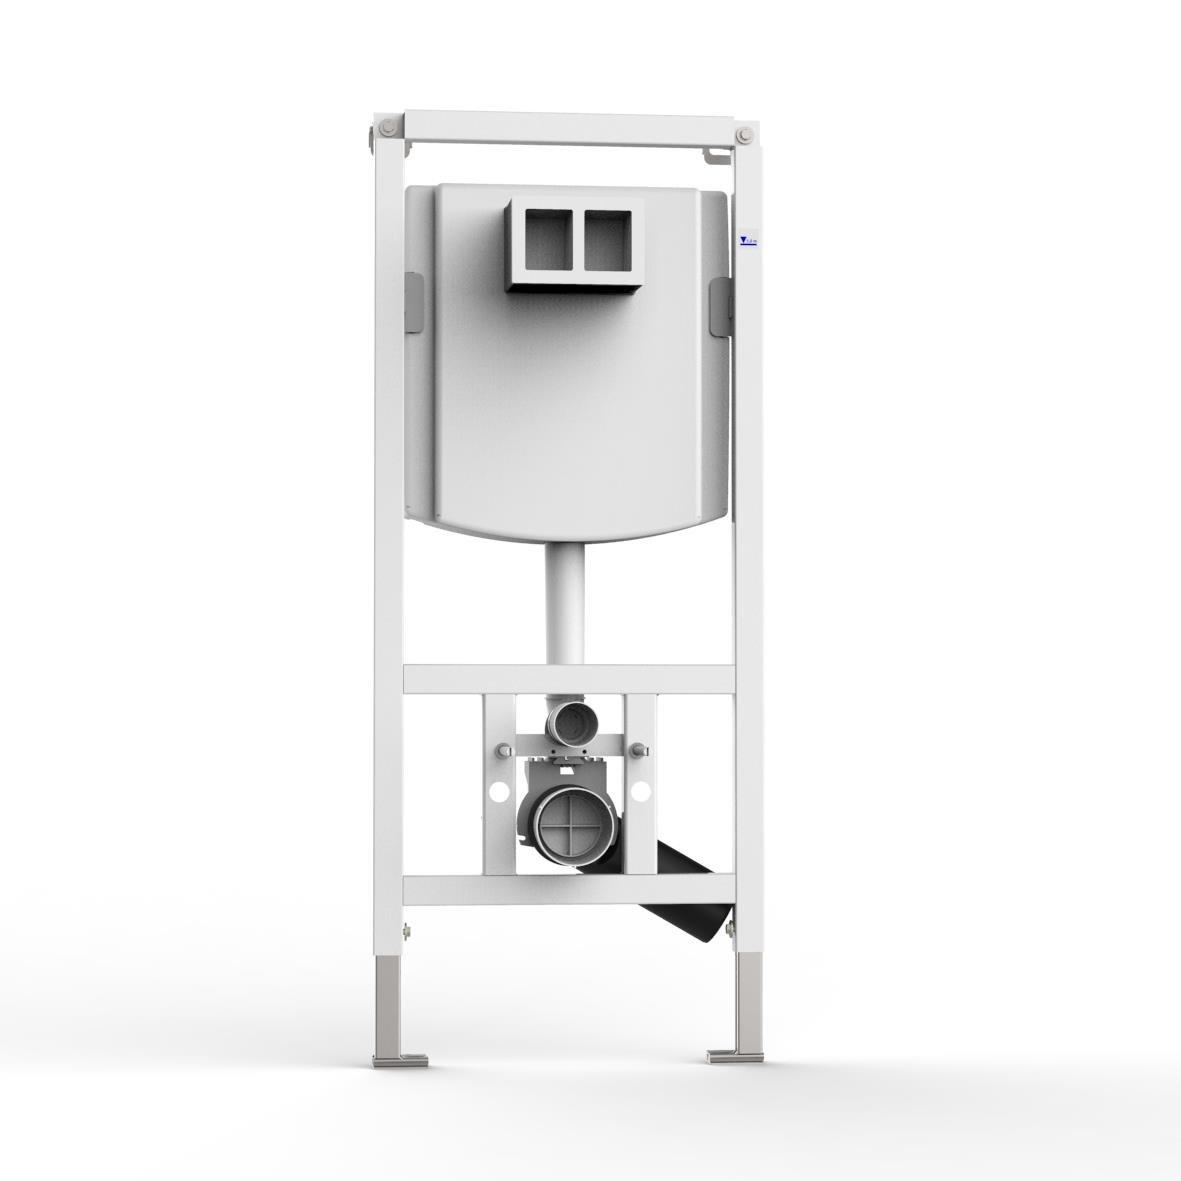 WC-Element VIS f.Trockenbau m.UP-Spü lkasten 7.5l BH:1185mm GC-Group